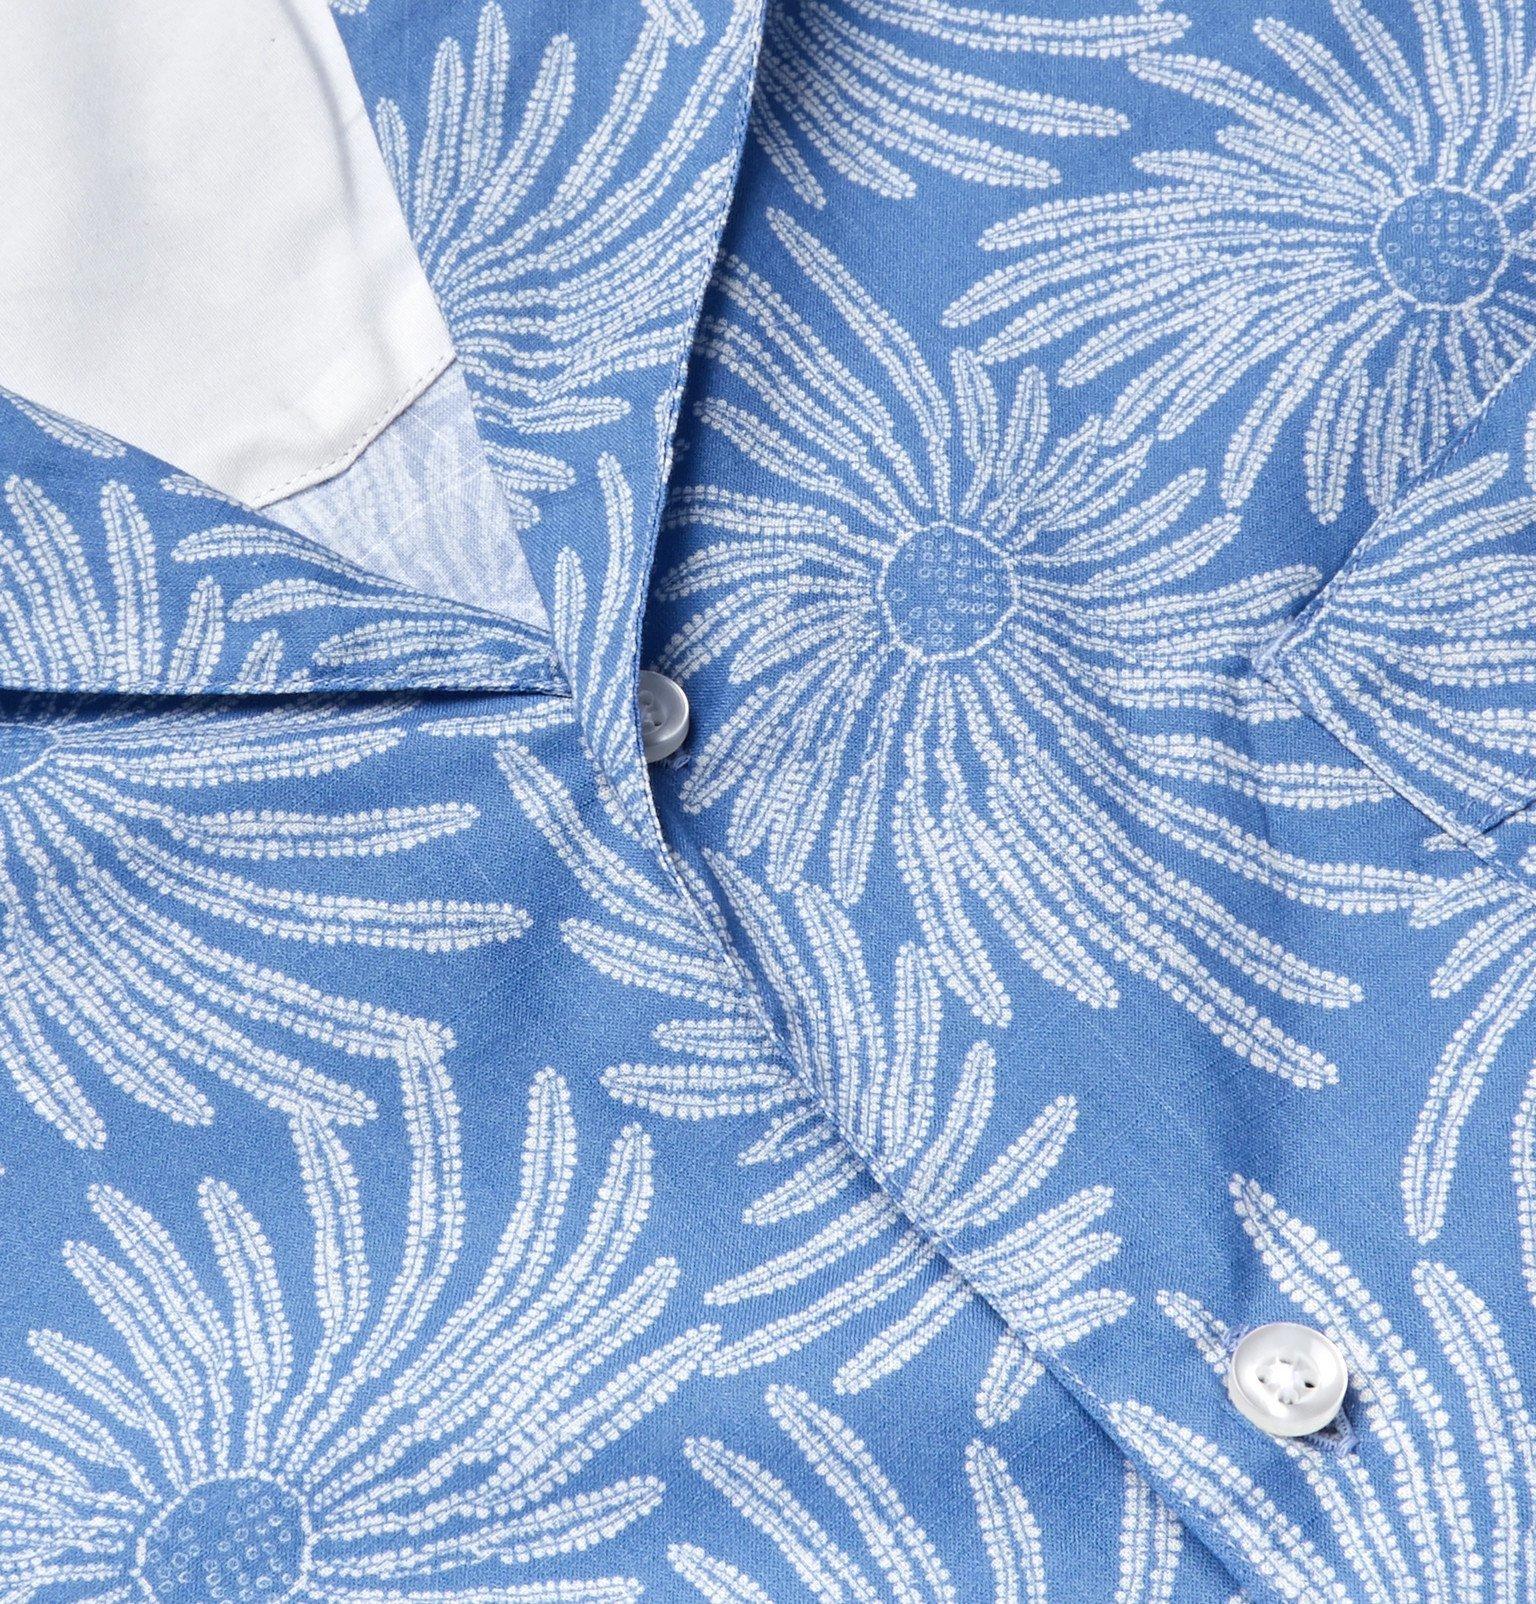 Officine Generale - Dario Camp-Collar Printed Cotton Shirt - Blue